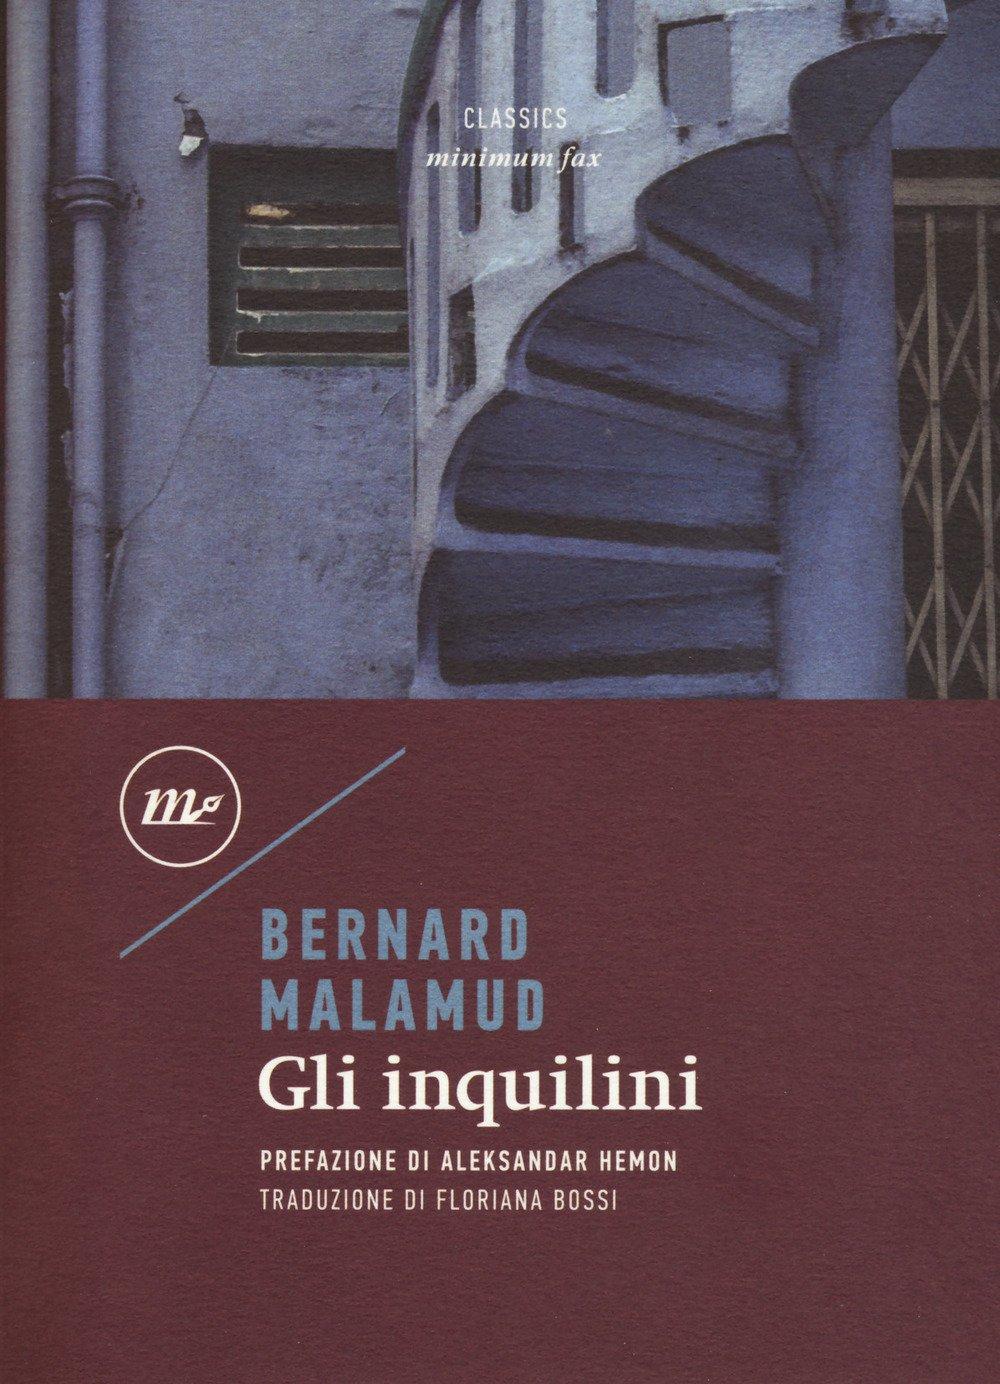 Bernard Malamud – Gli Inquilini